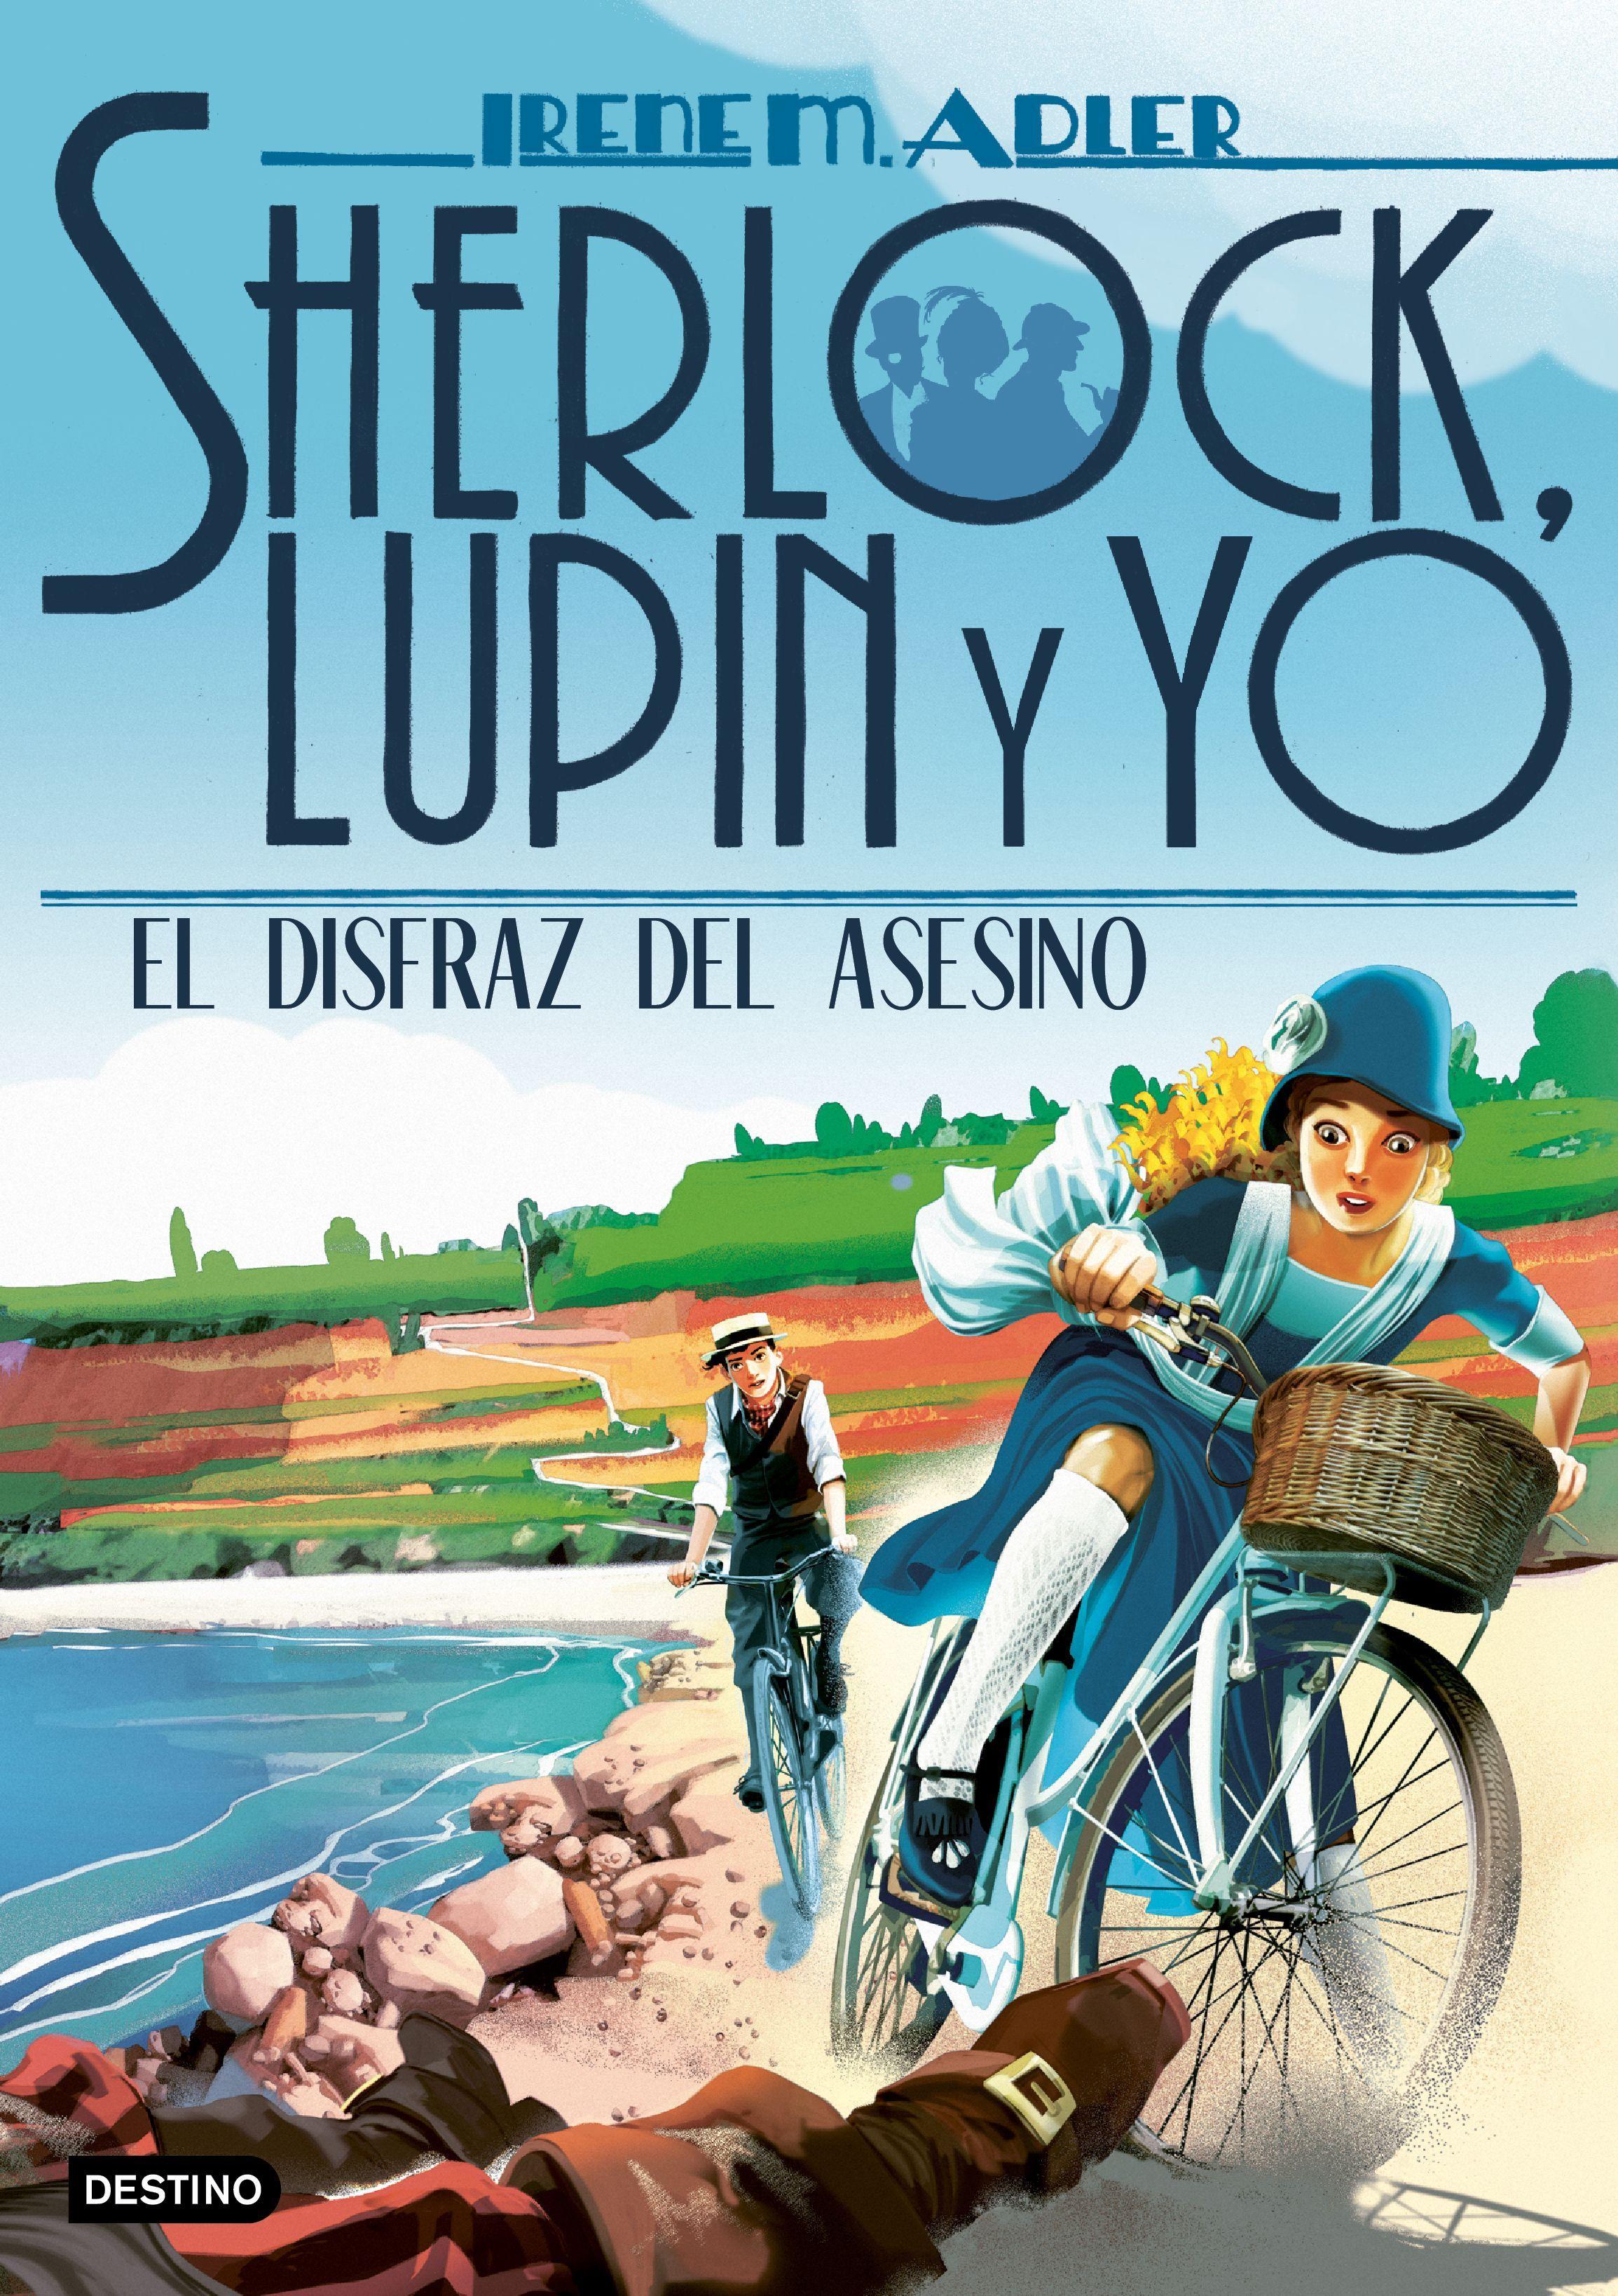 SHERLOCK LUPIN Y YO 16 EL DISFRAZ DEL ASESINO